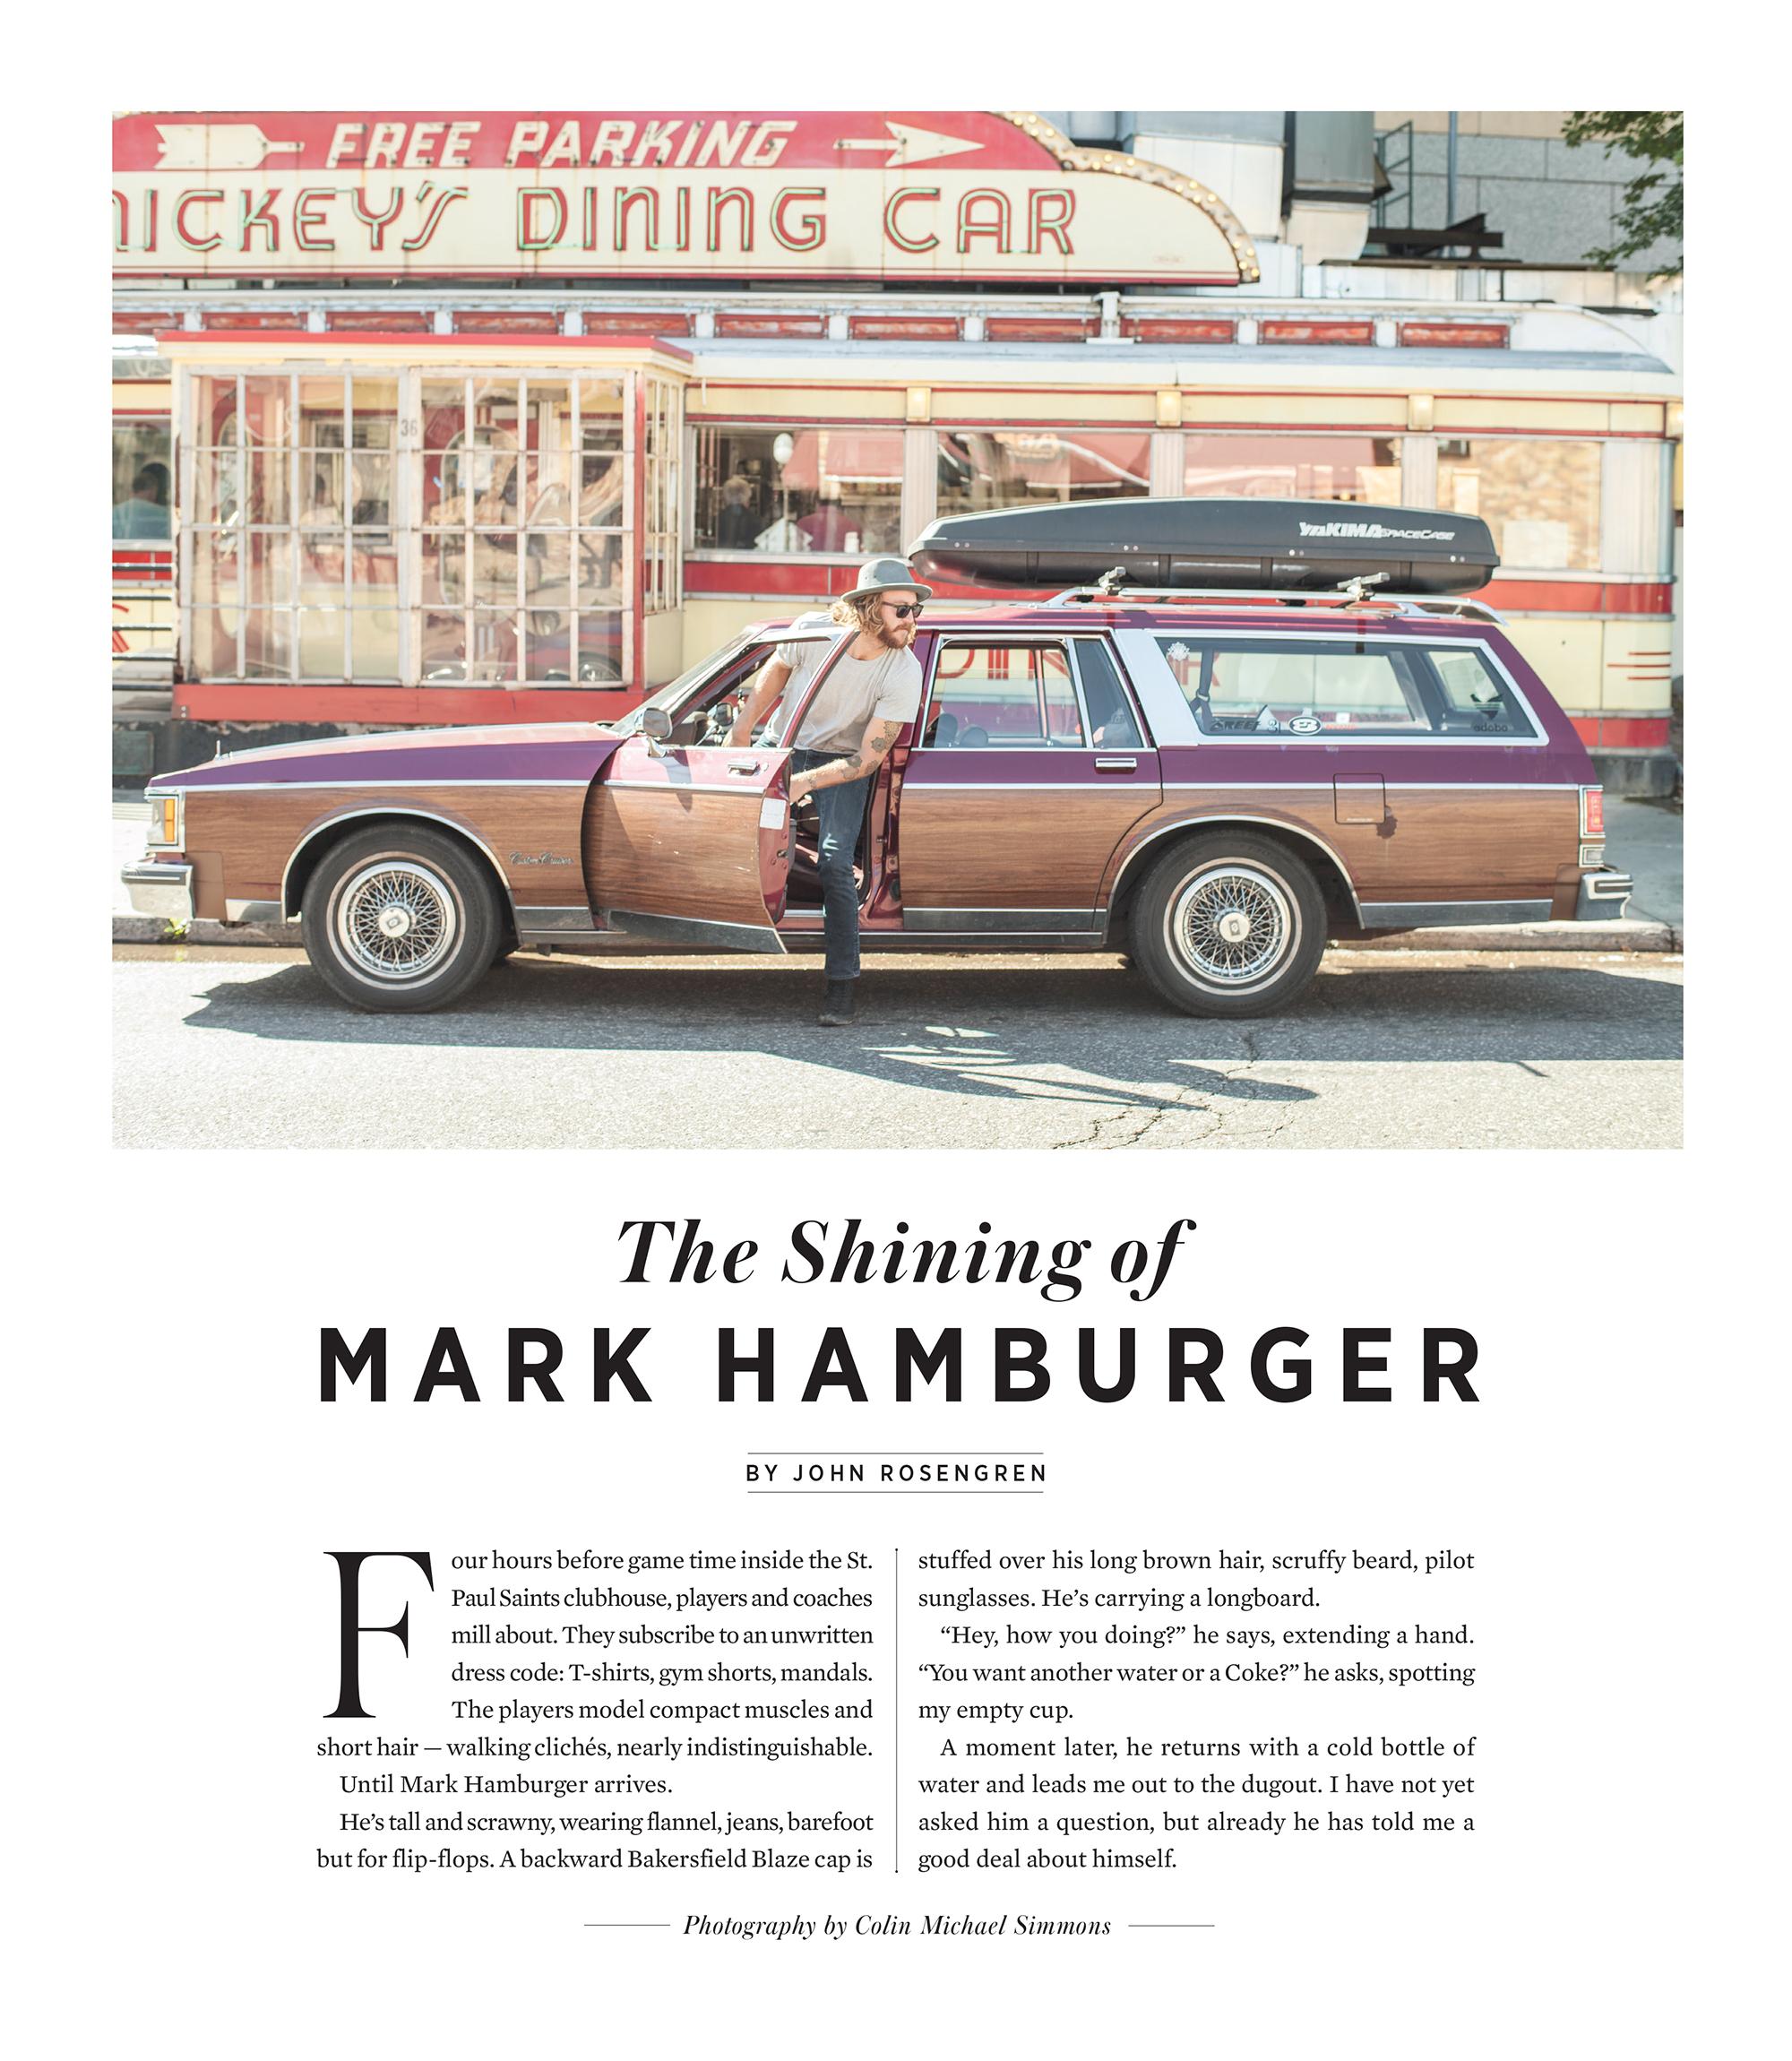 MarkHamburger.jpg